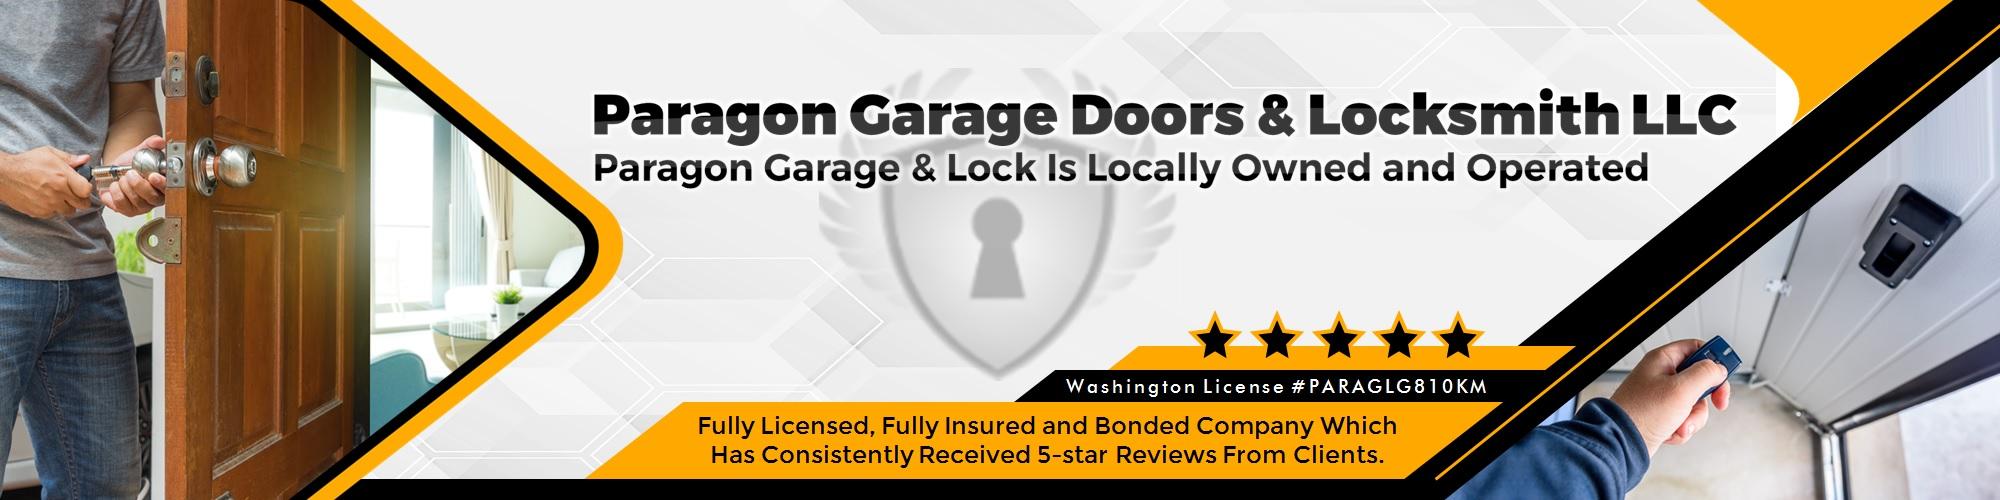 Paragon Garage Doors & Locksmith LLC - Locksmith & Garage Door Service